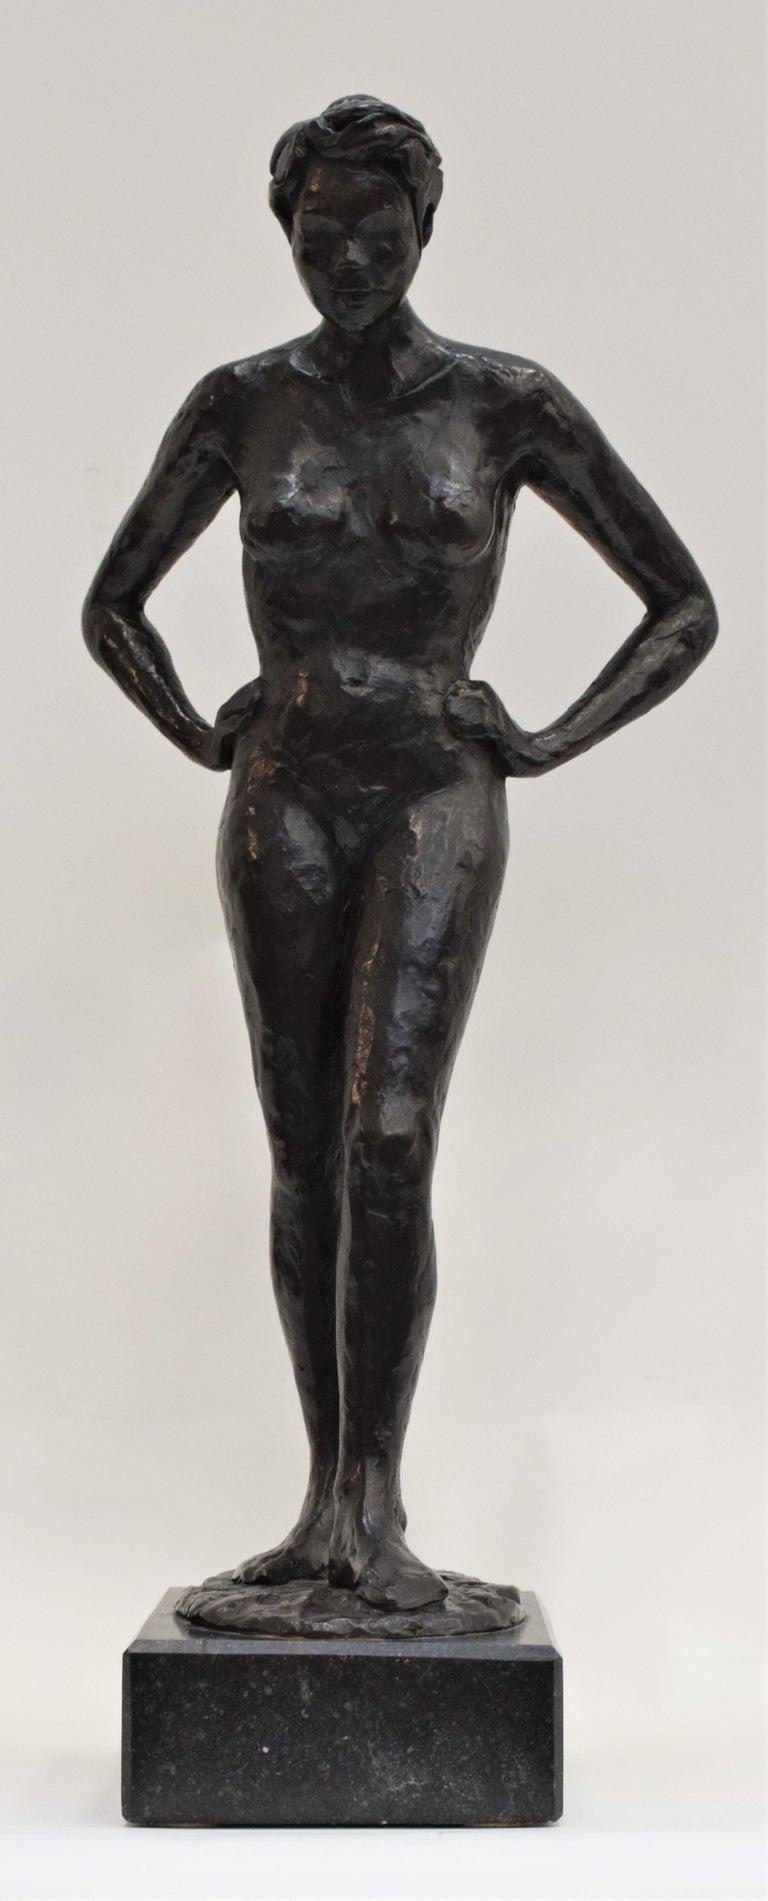 Anneke Hei-Degenhardt Figurative Sculpture - Bronze statue of a woman, Anneke Hei - Degenhardt (1951), Signed